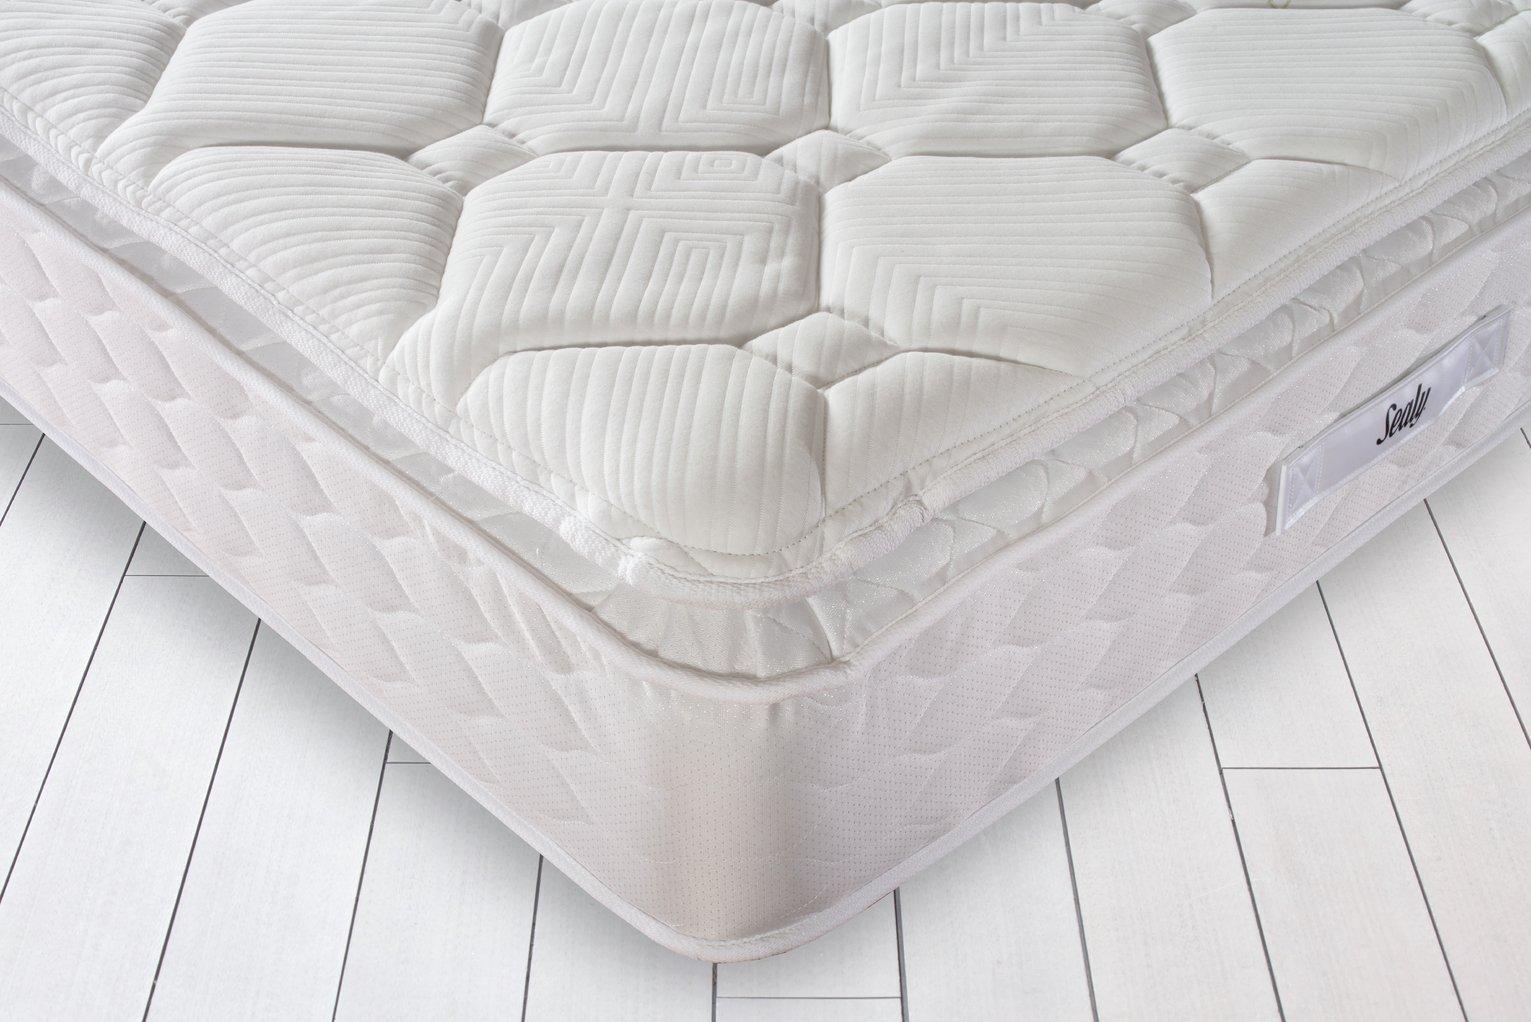 Sealy Activ Geltex Pillowtop Double Mattress